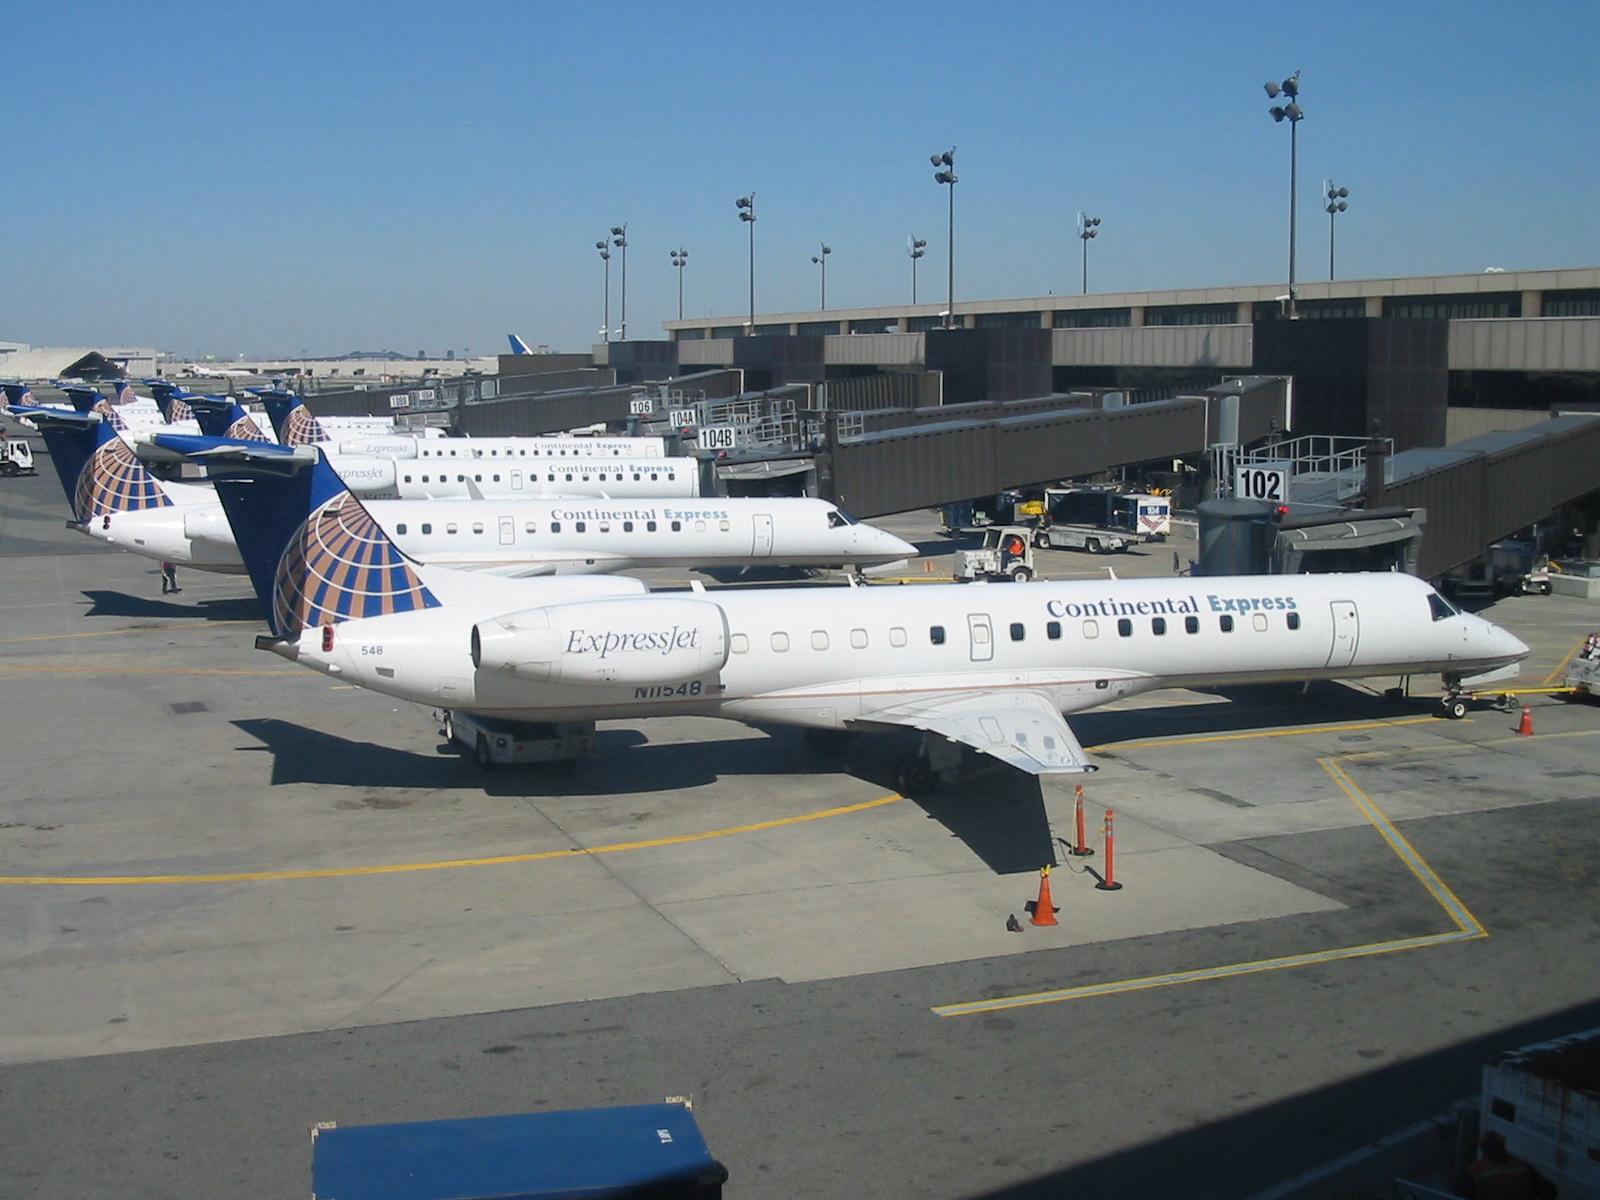 милан аэропорт мальпенса схема